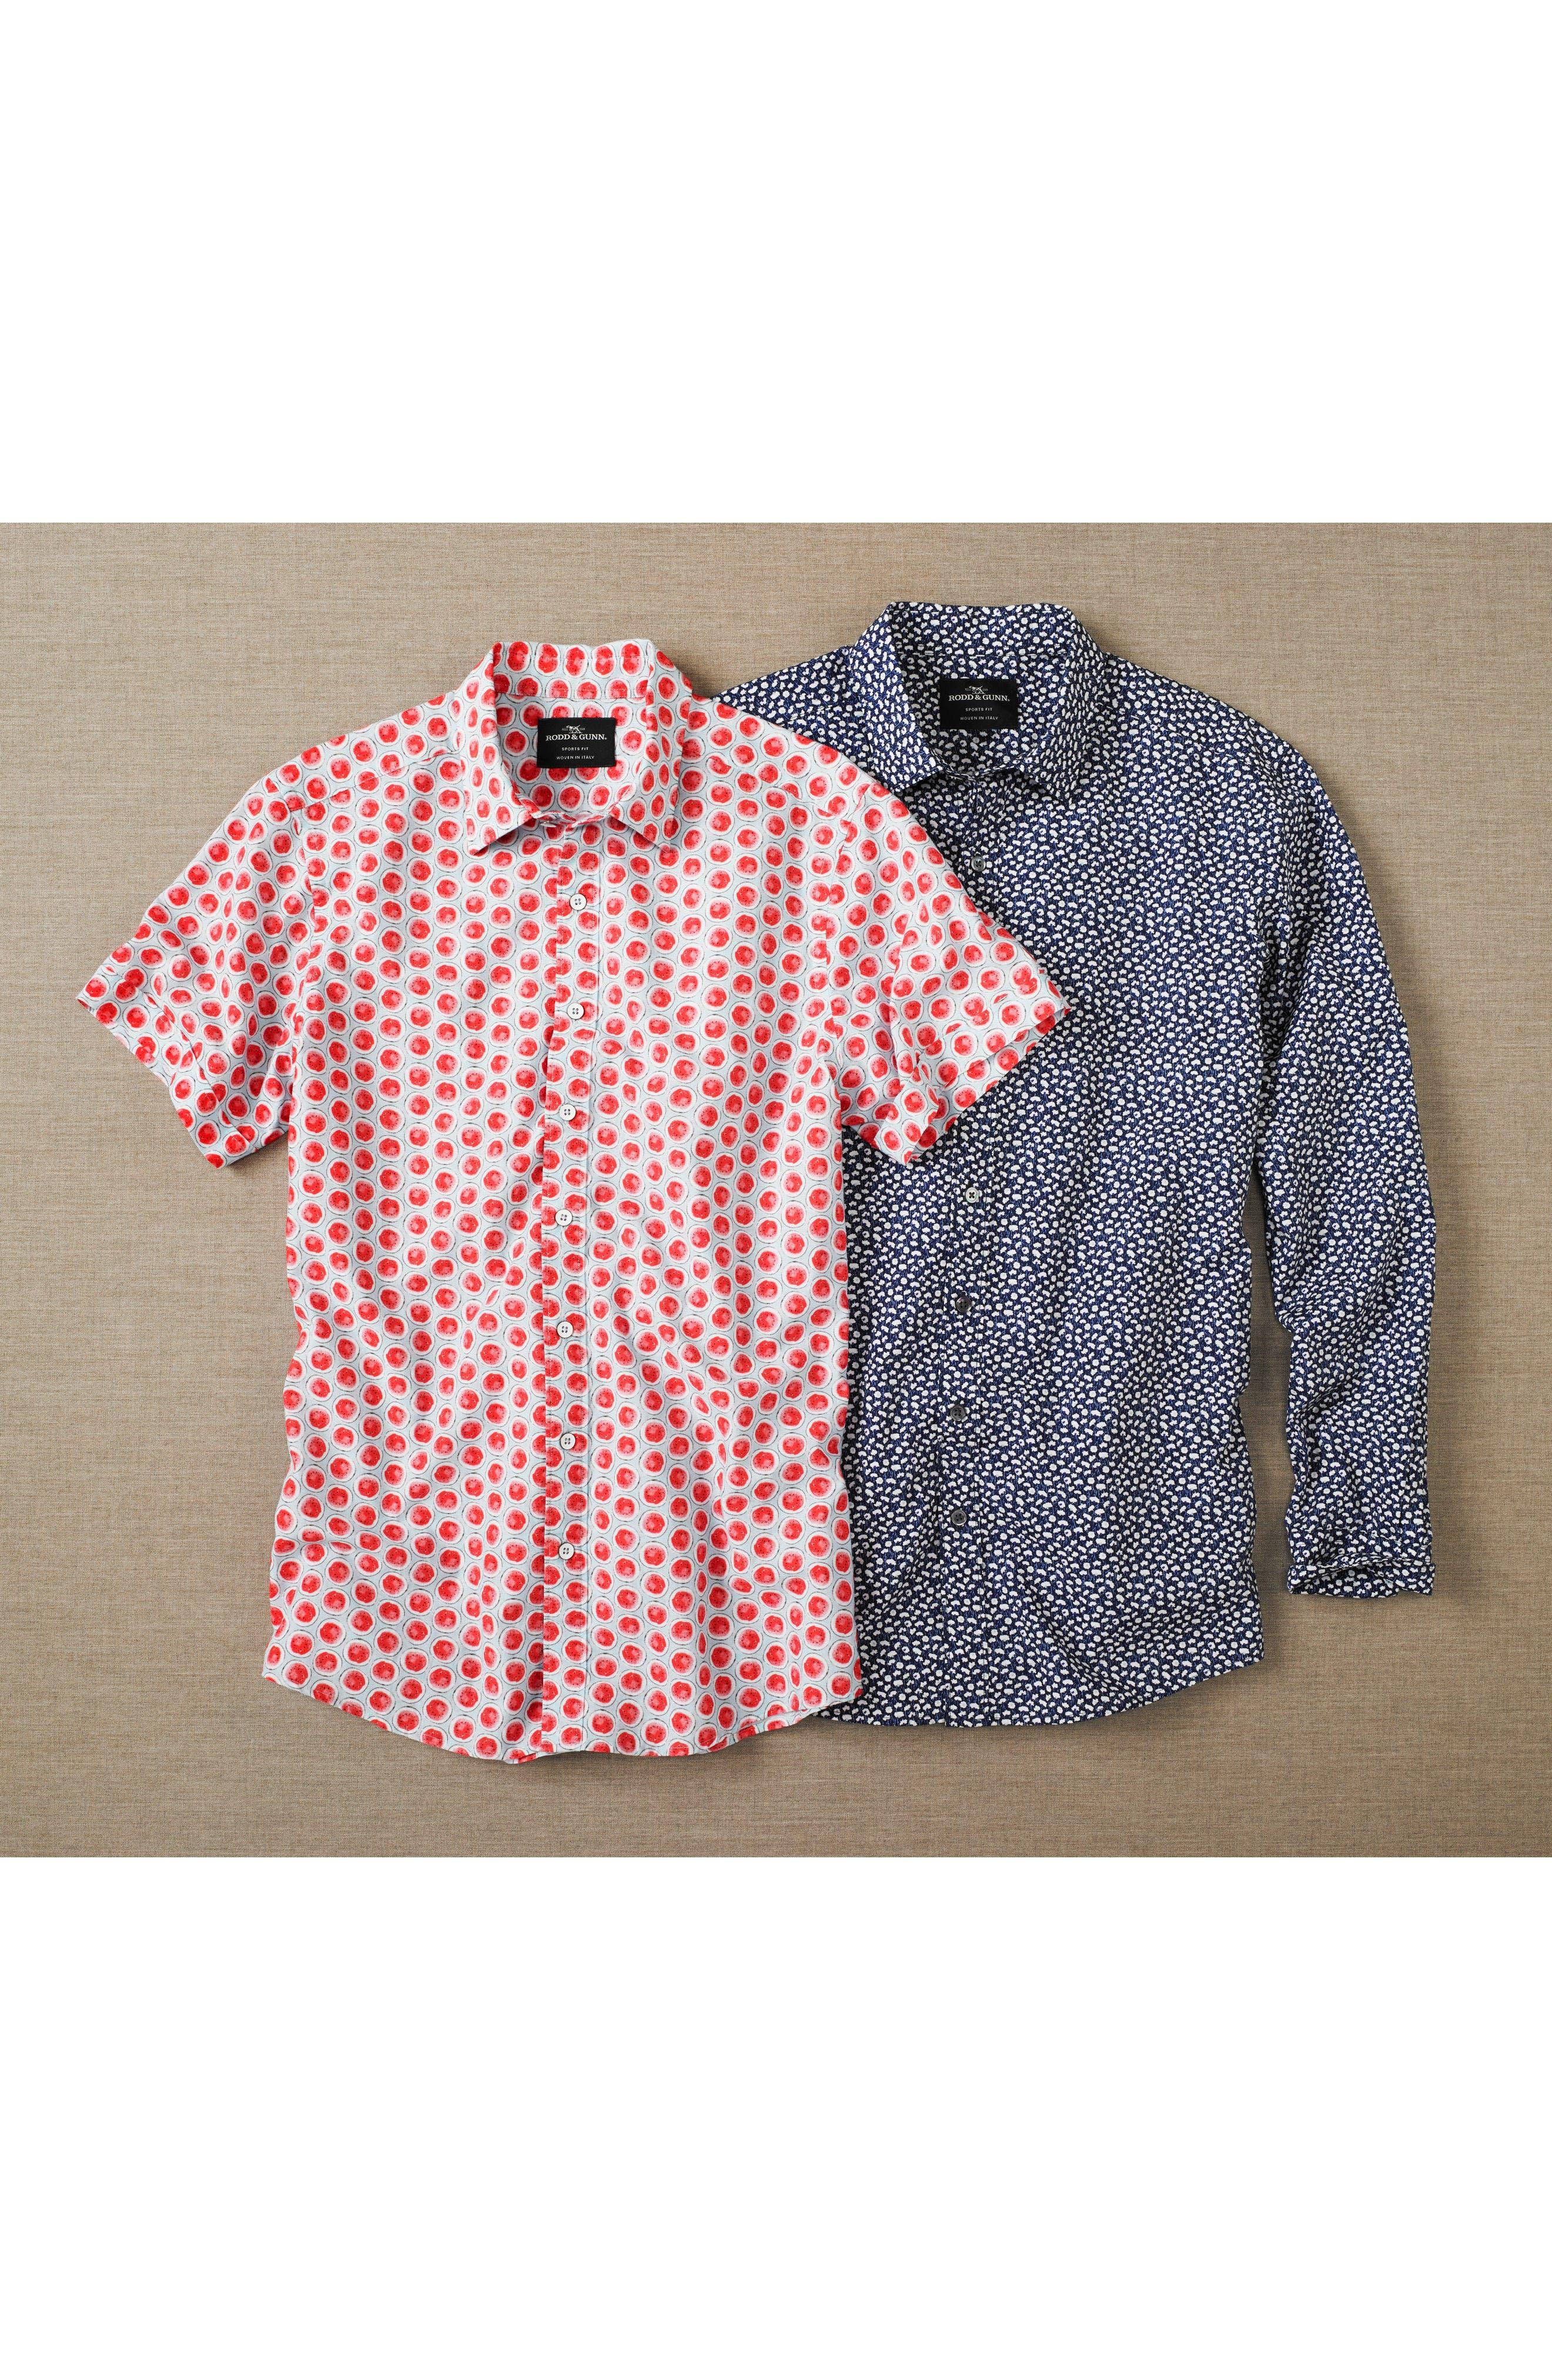 Marshland Sports Fit Sport Shirt,                             Alternate thumbnail 7, color,                             400